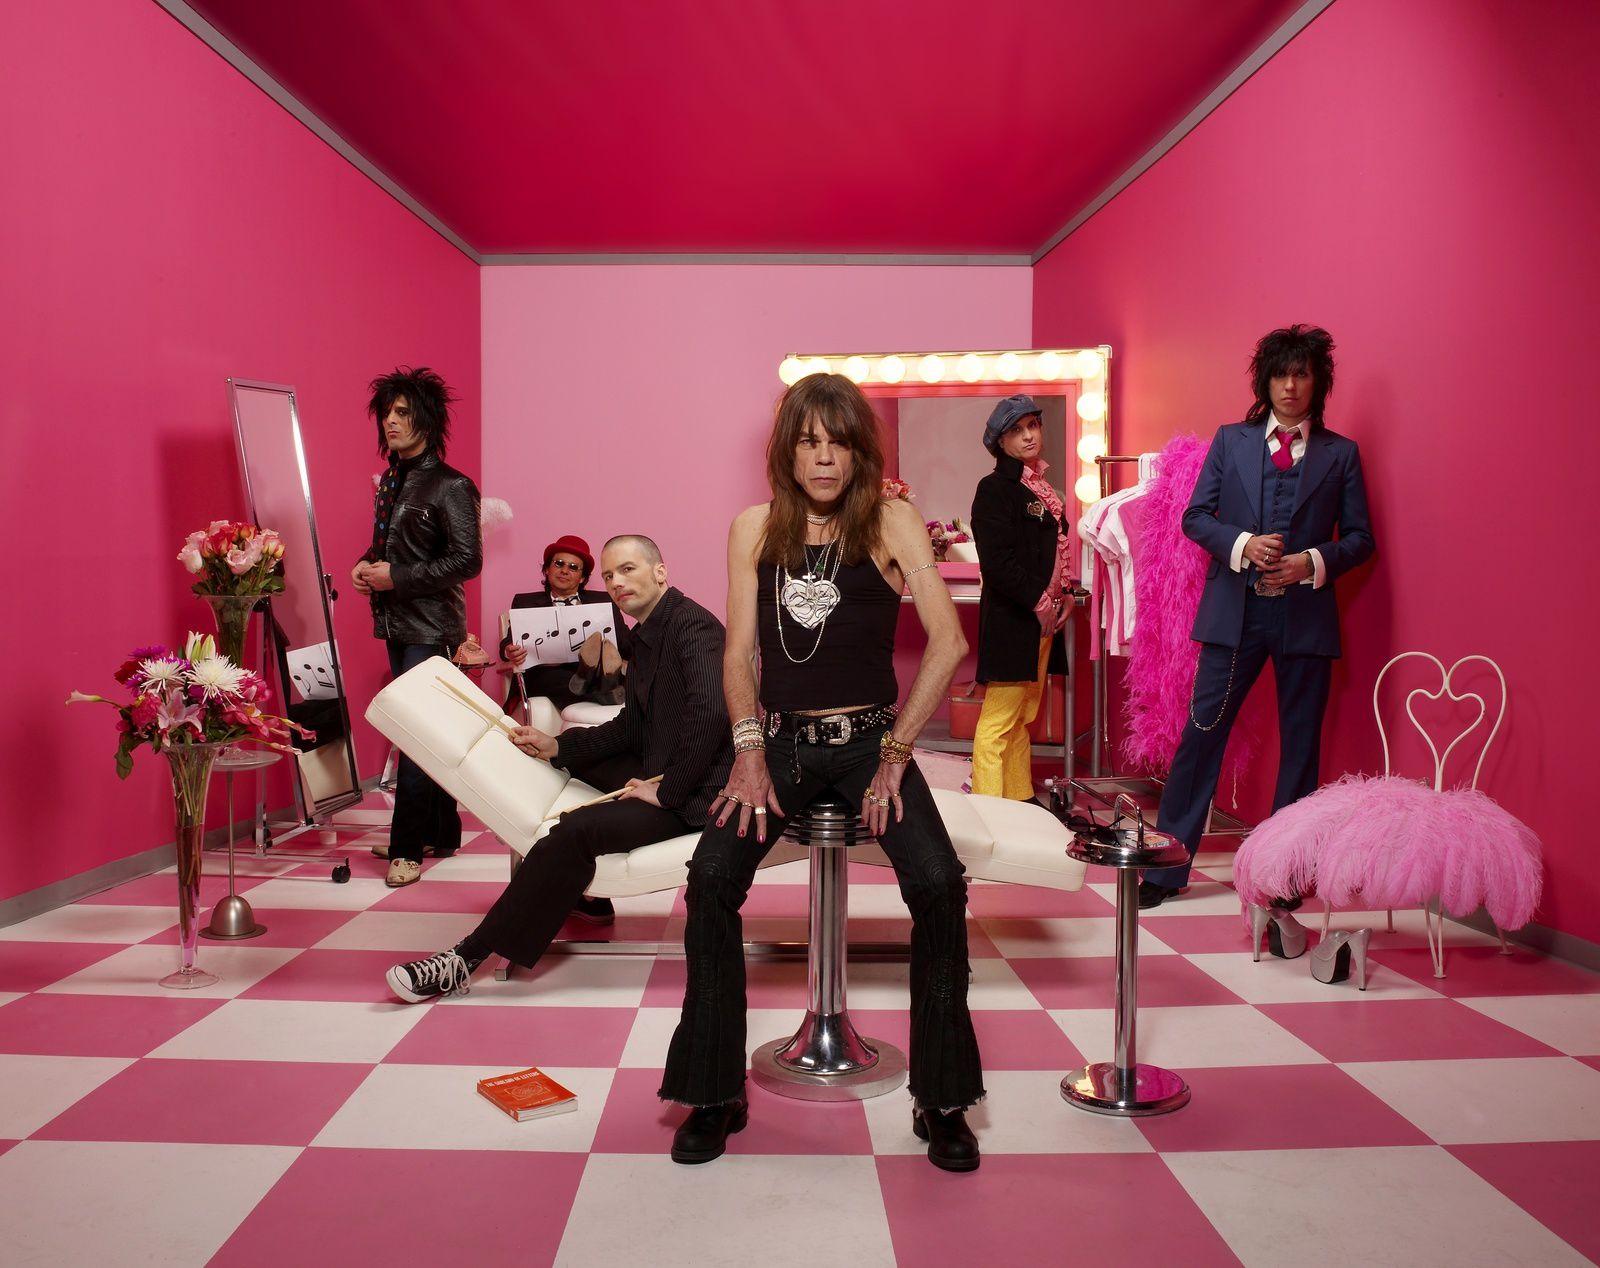 Steve Conte and the New York Dolls - source: pressdispensary.co.uks